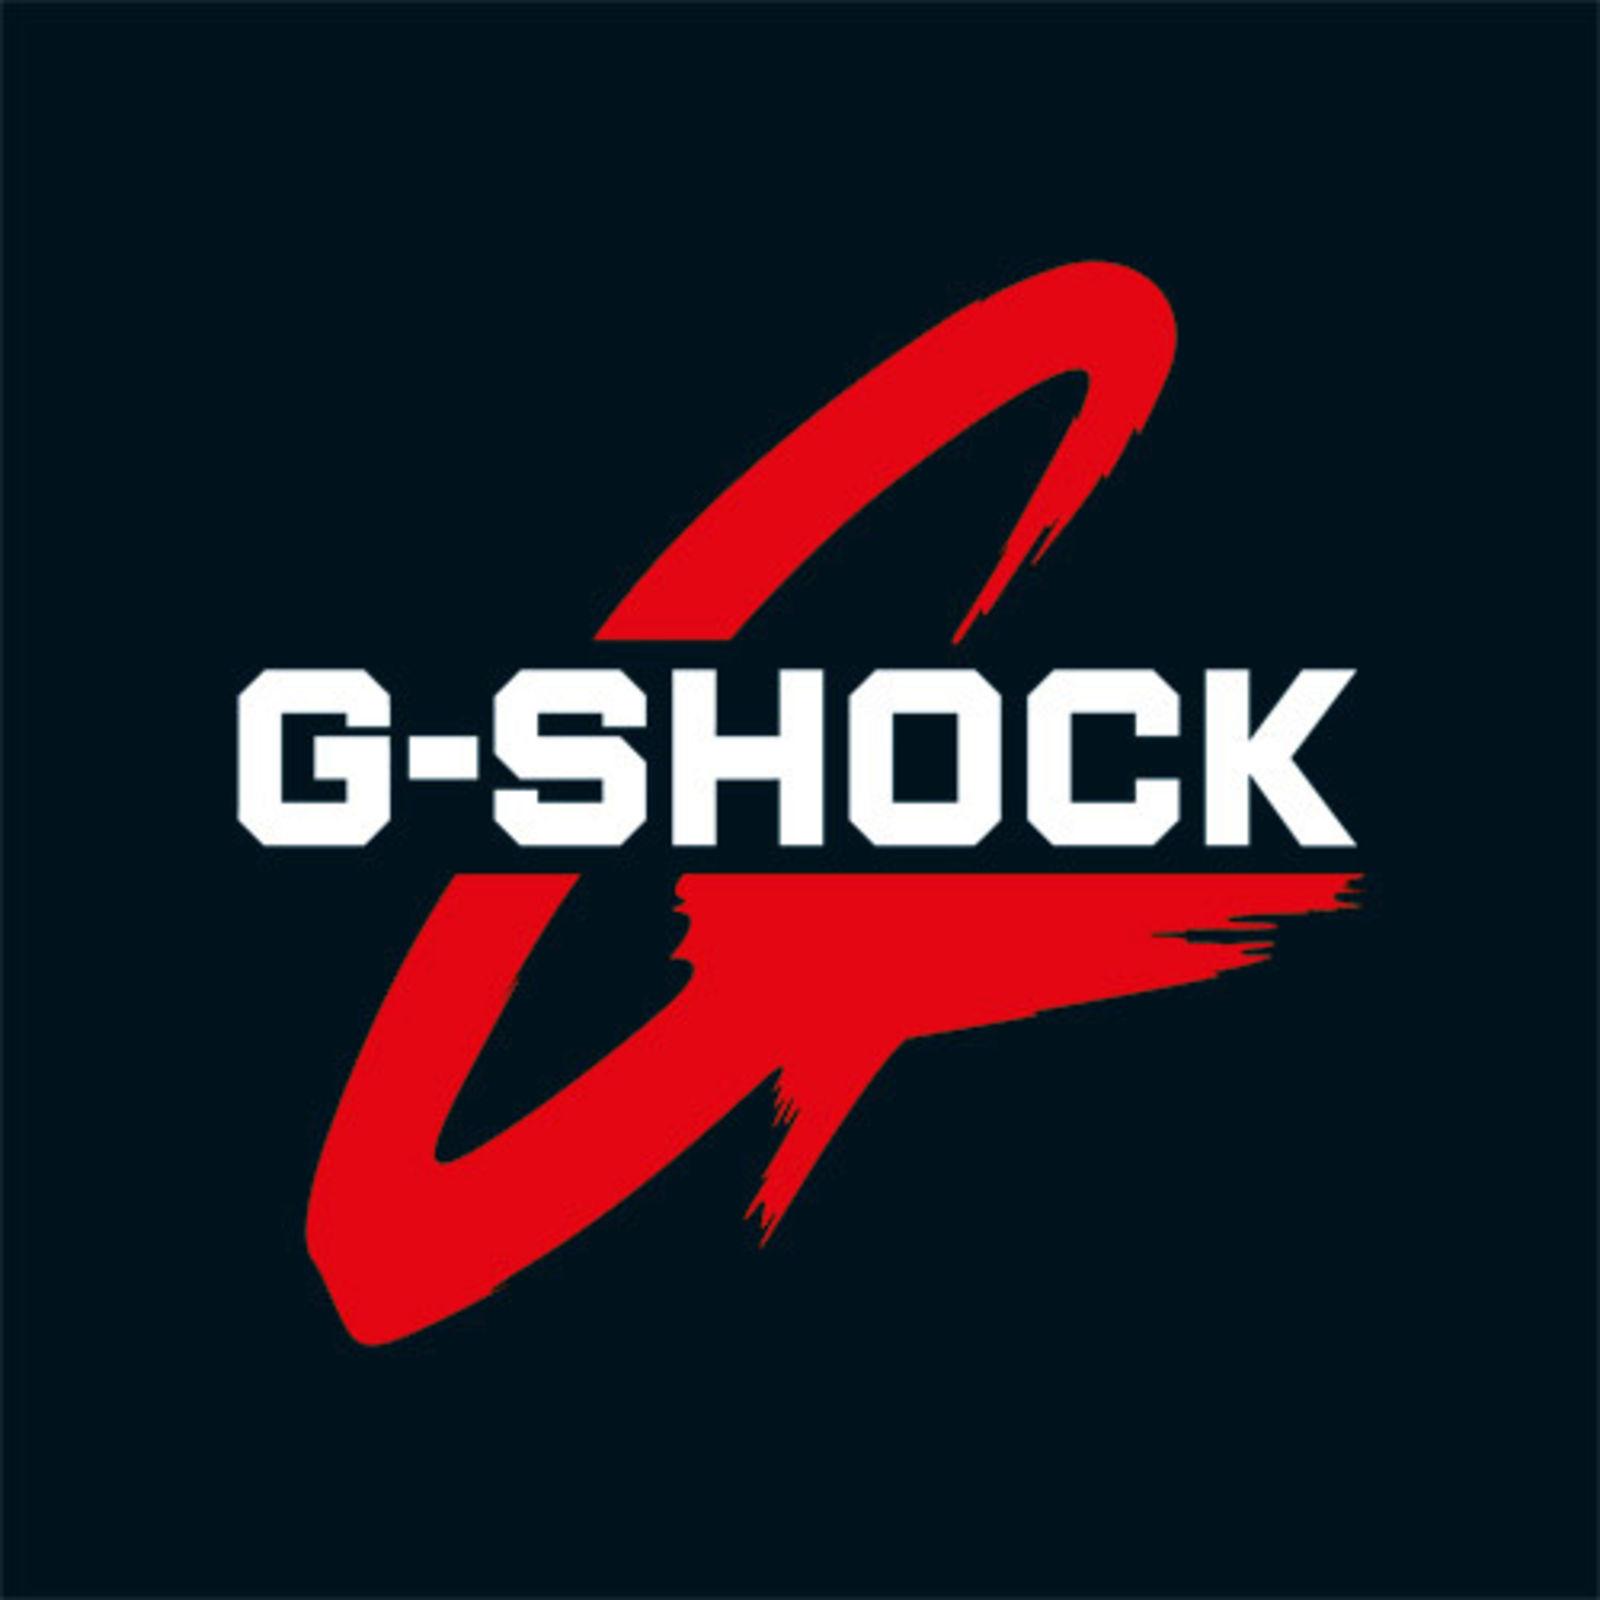 G-SHOCK (Image 1)